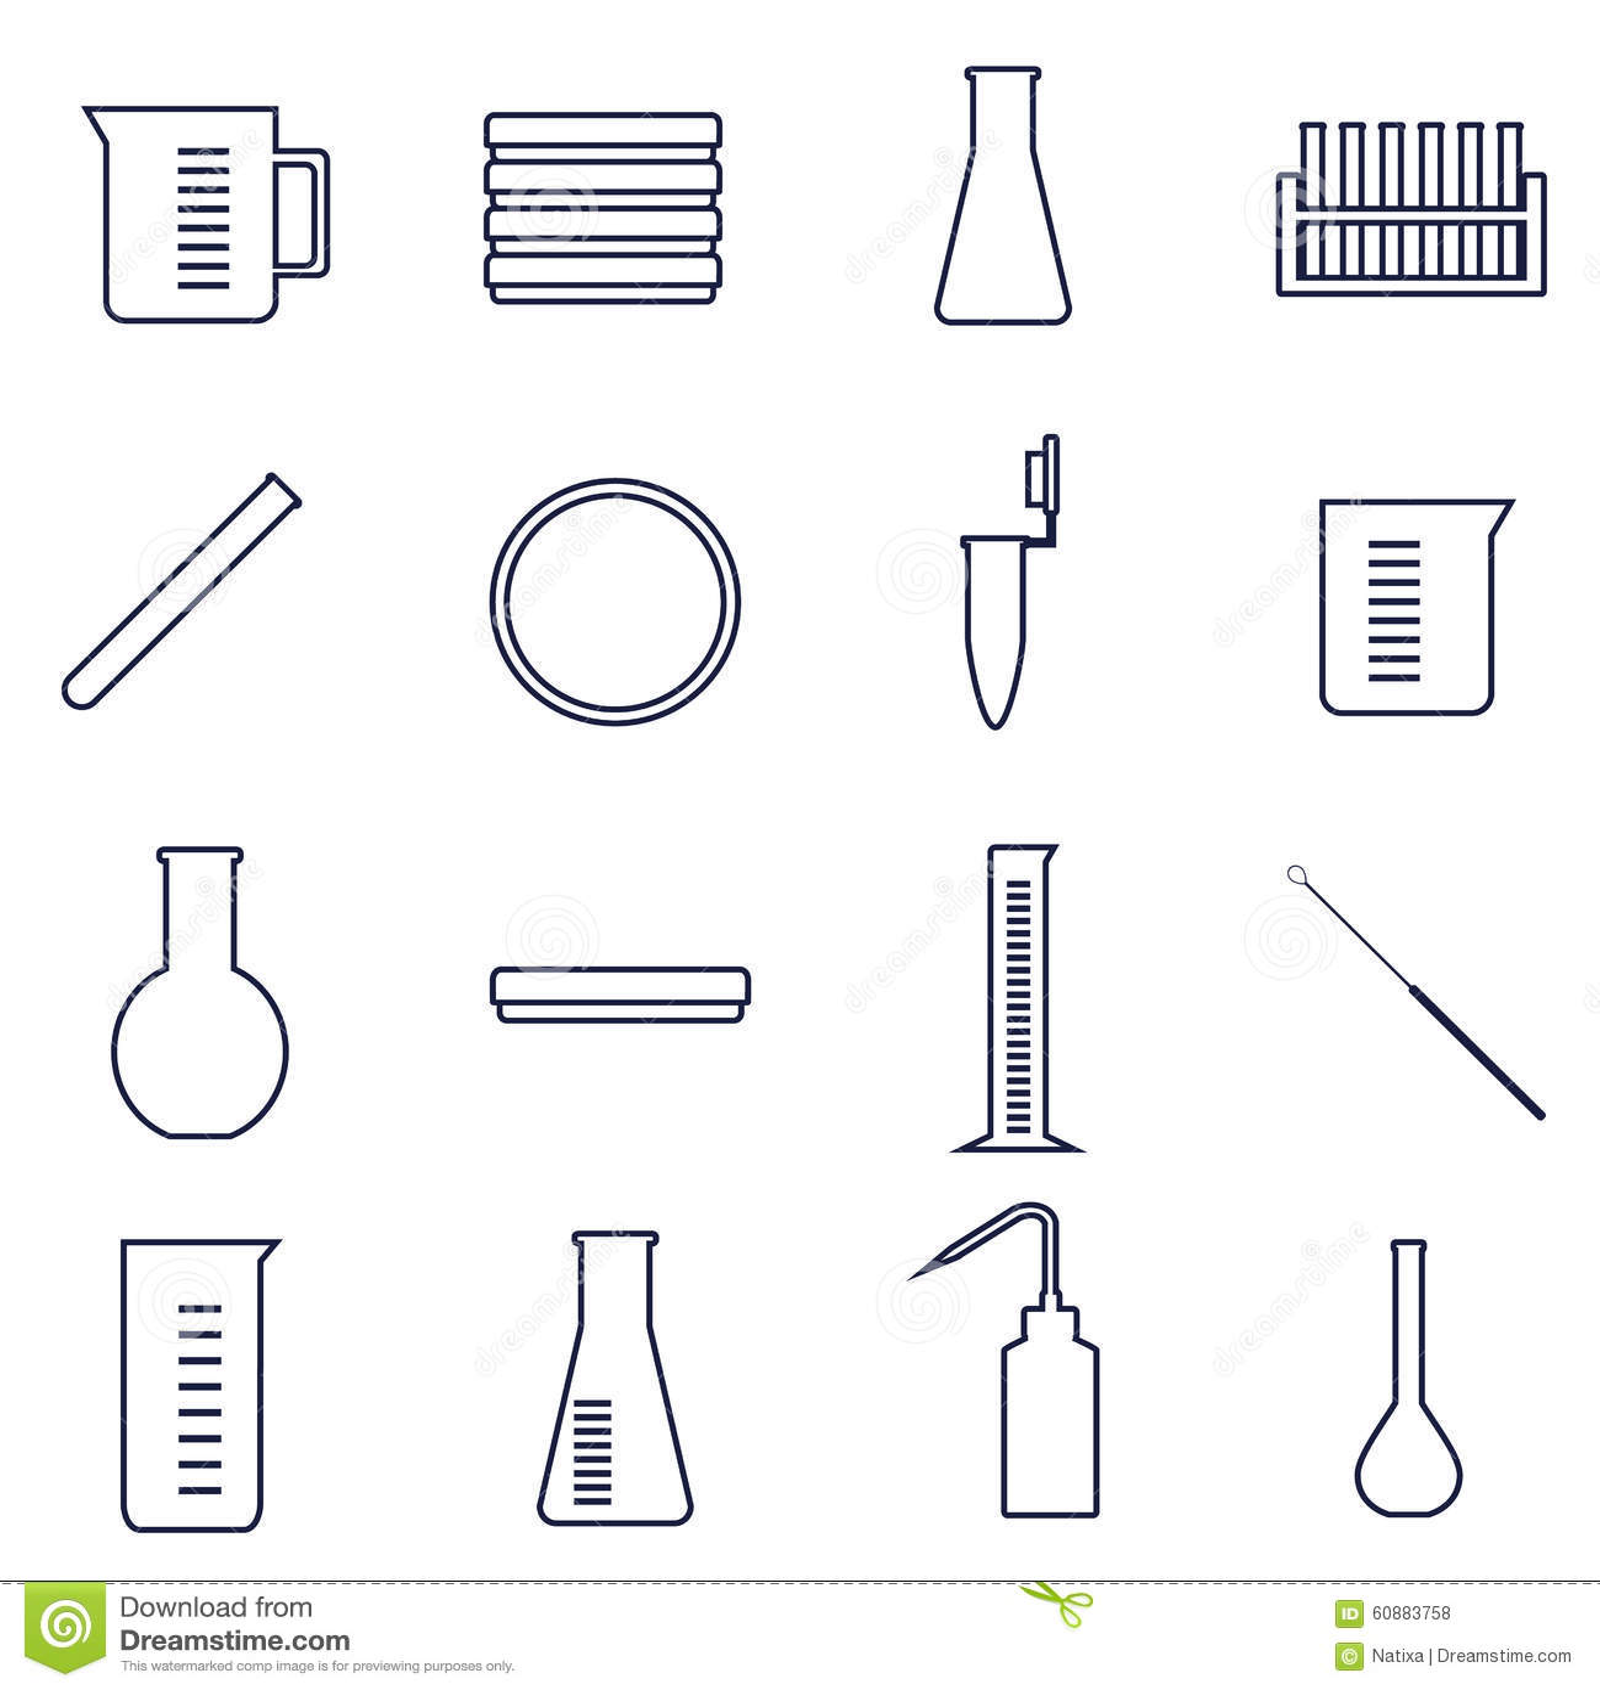 Chemistry Lab Tools Worksheet